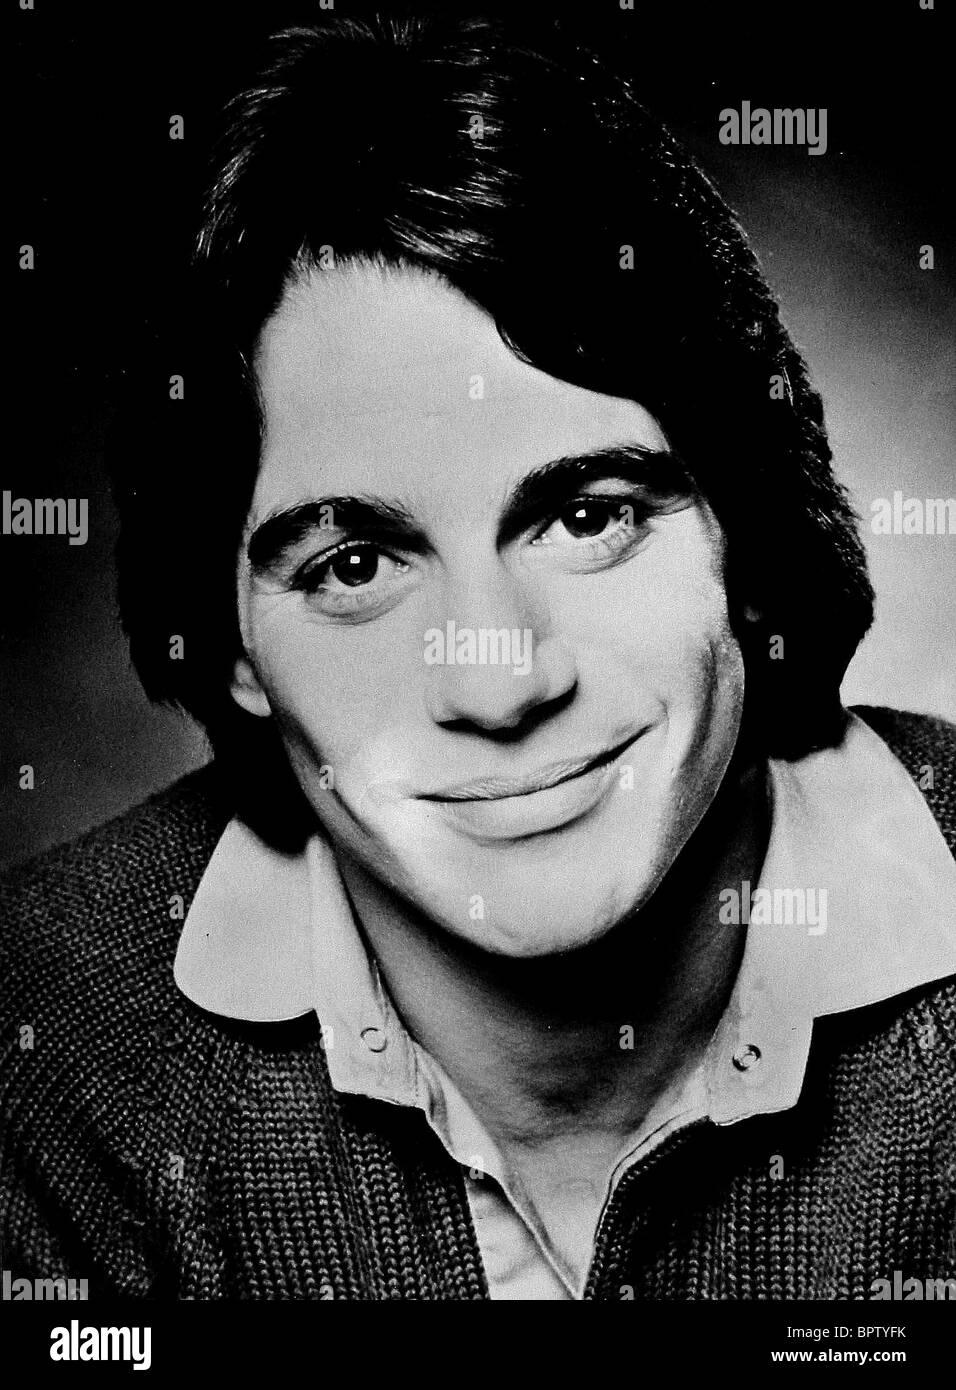 TONY DANZA ACTOR (1978) - Stock Image